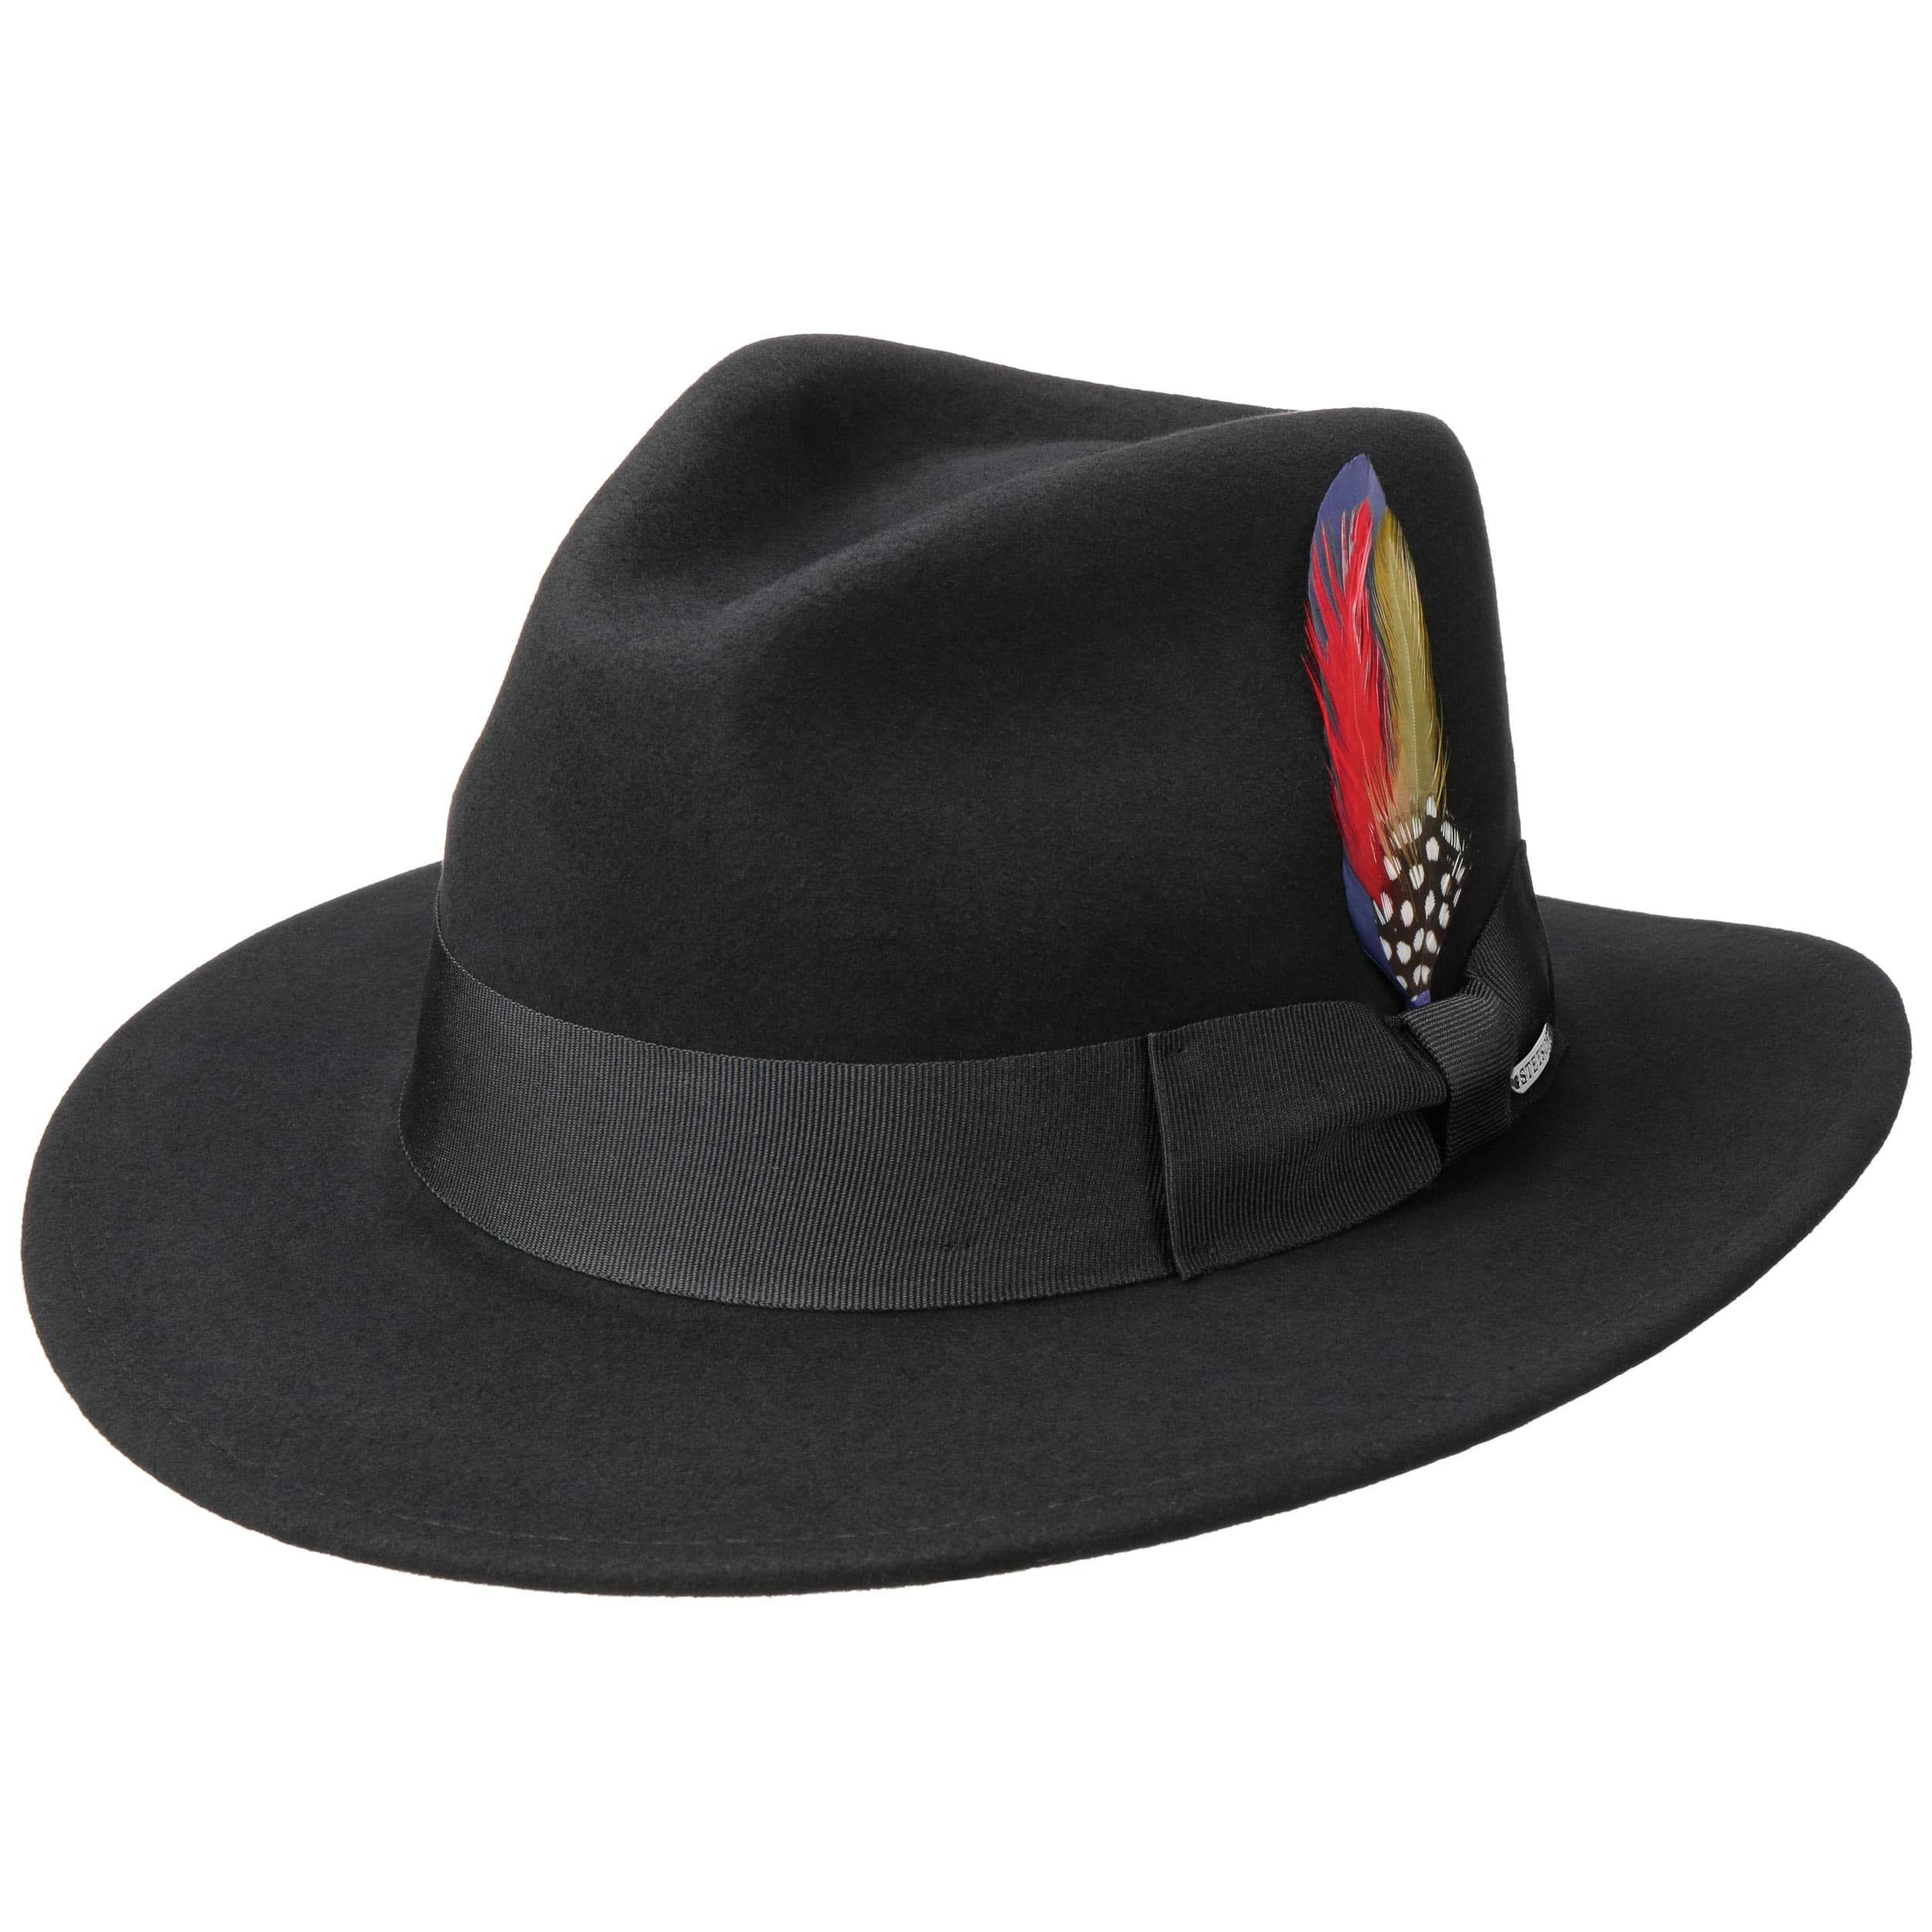 Vernard Wool Felt Hat with Cashmere black